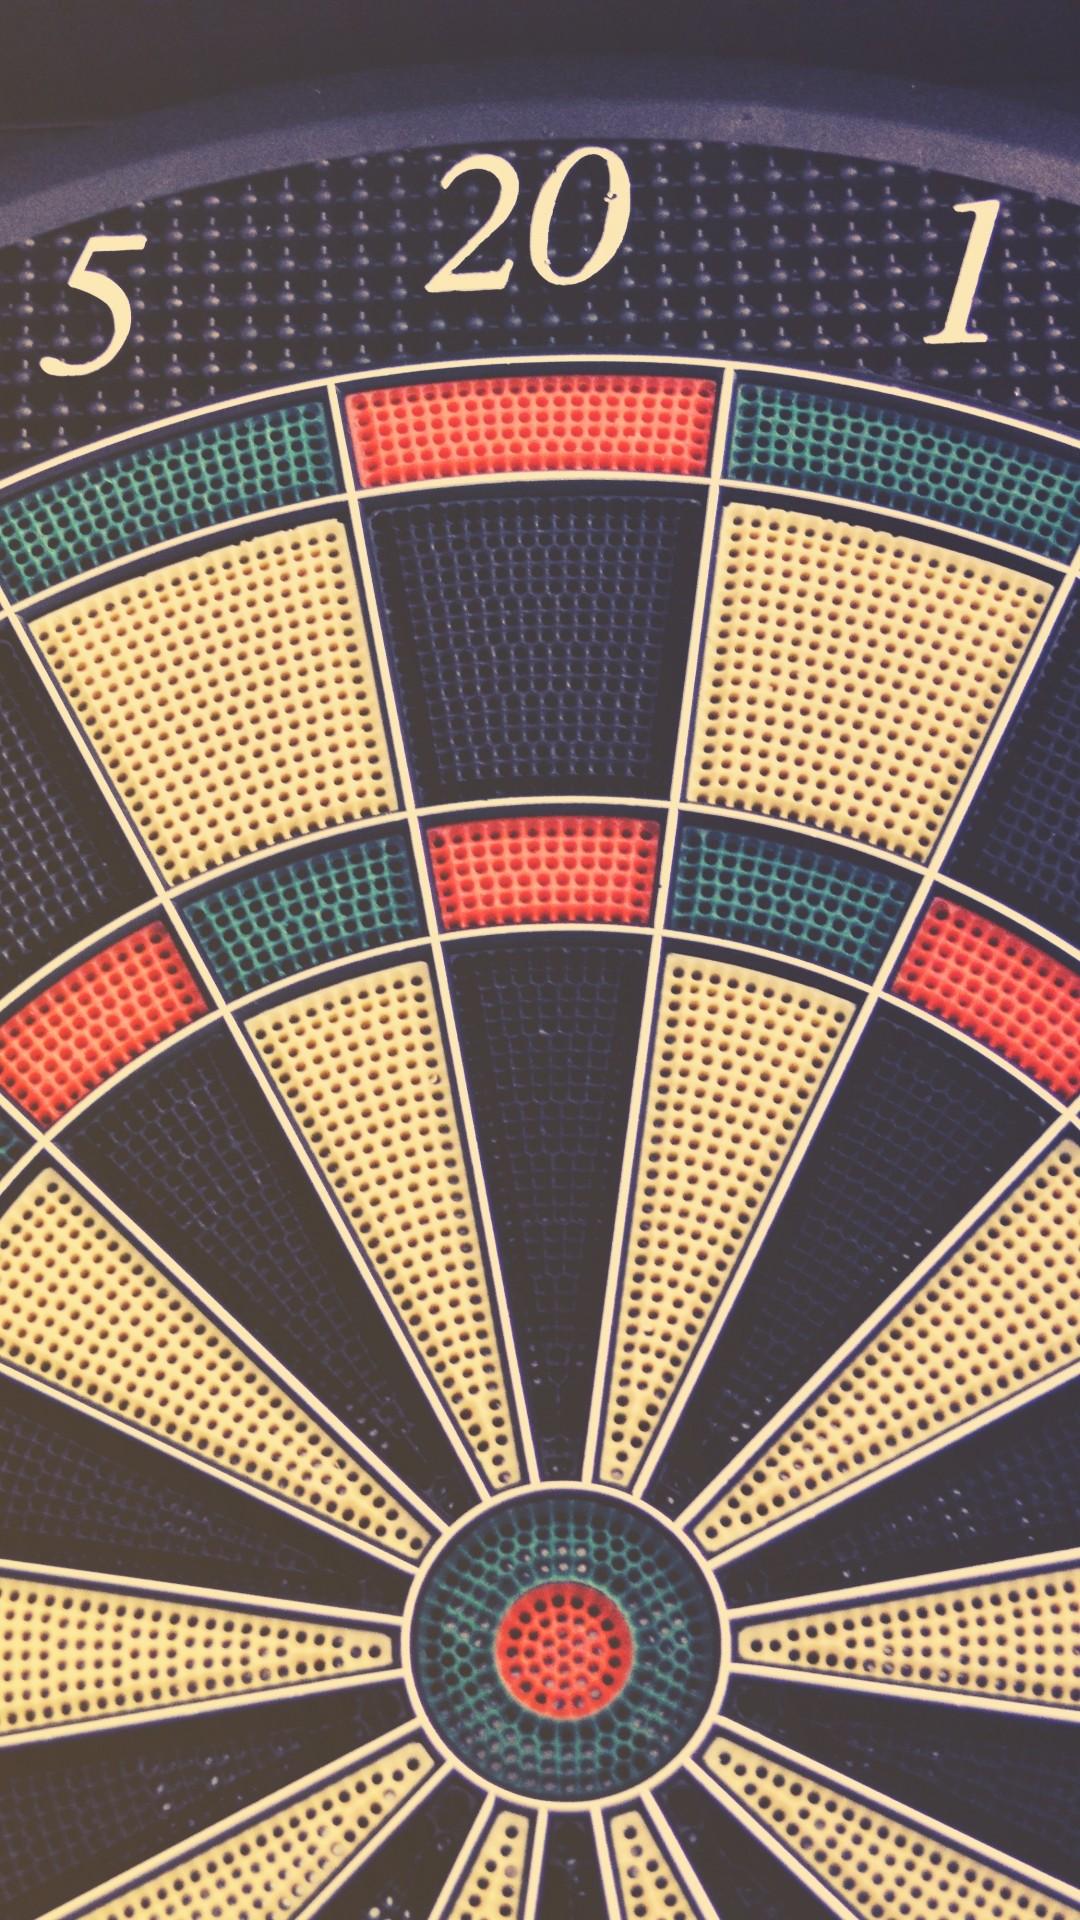 Free Darts Board phone wallpaper by 5h4n3